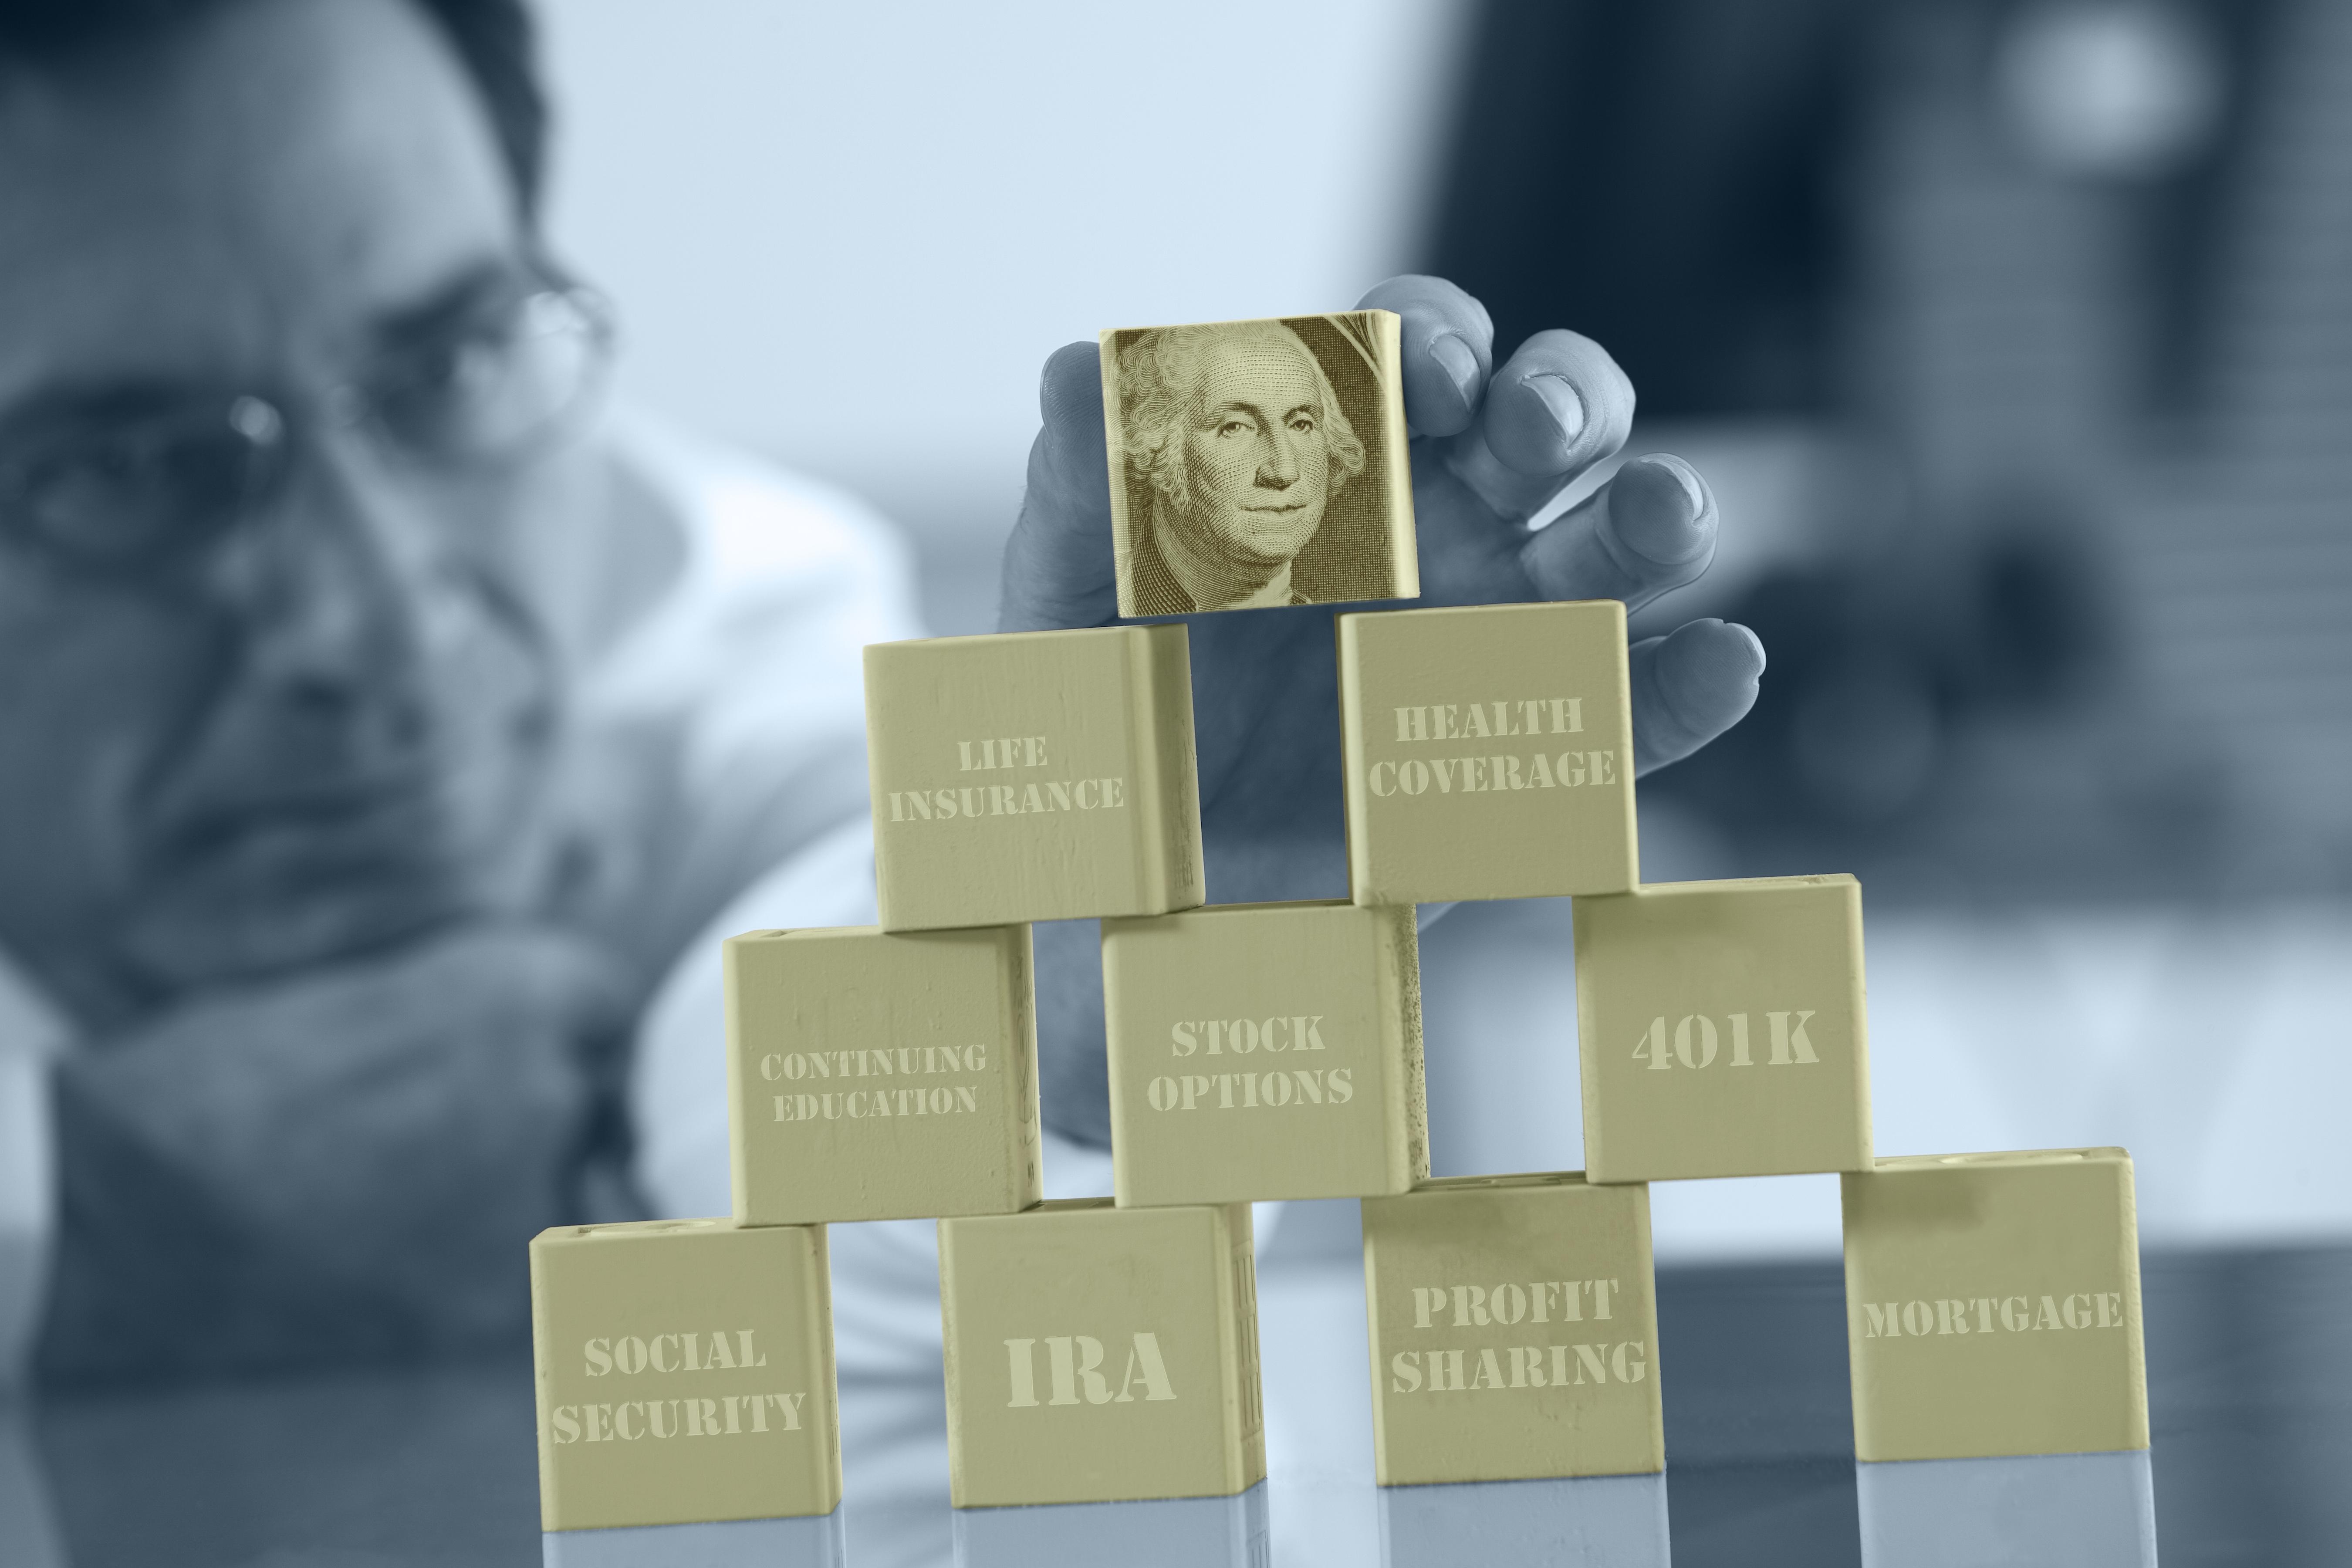 A man stacks gold-colored blocks that represent financial building blocks.